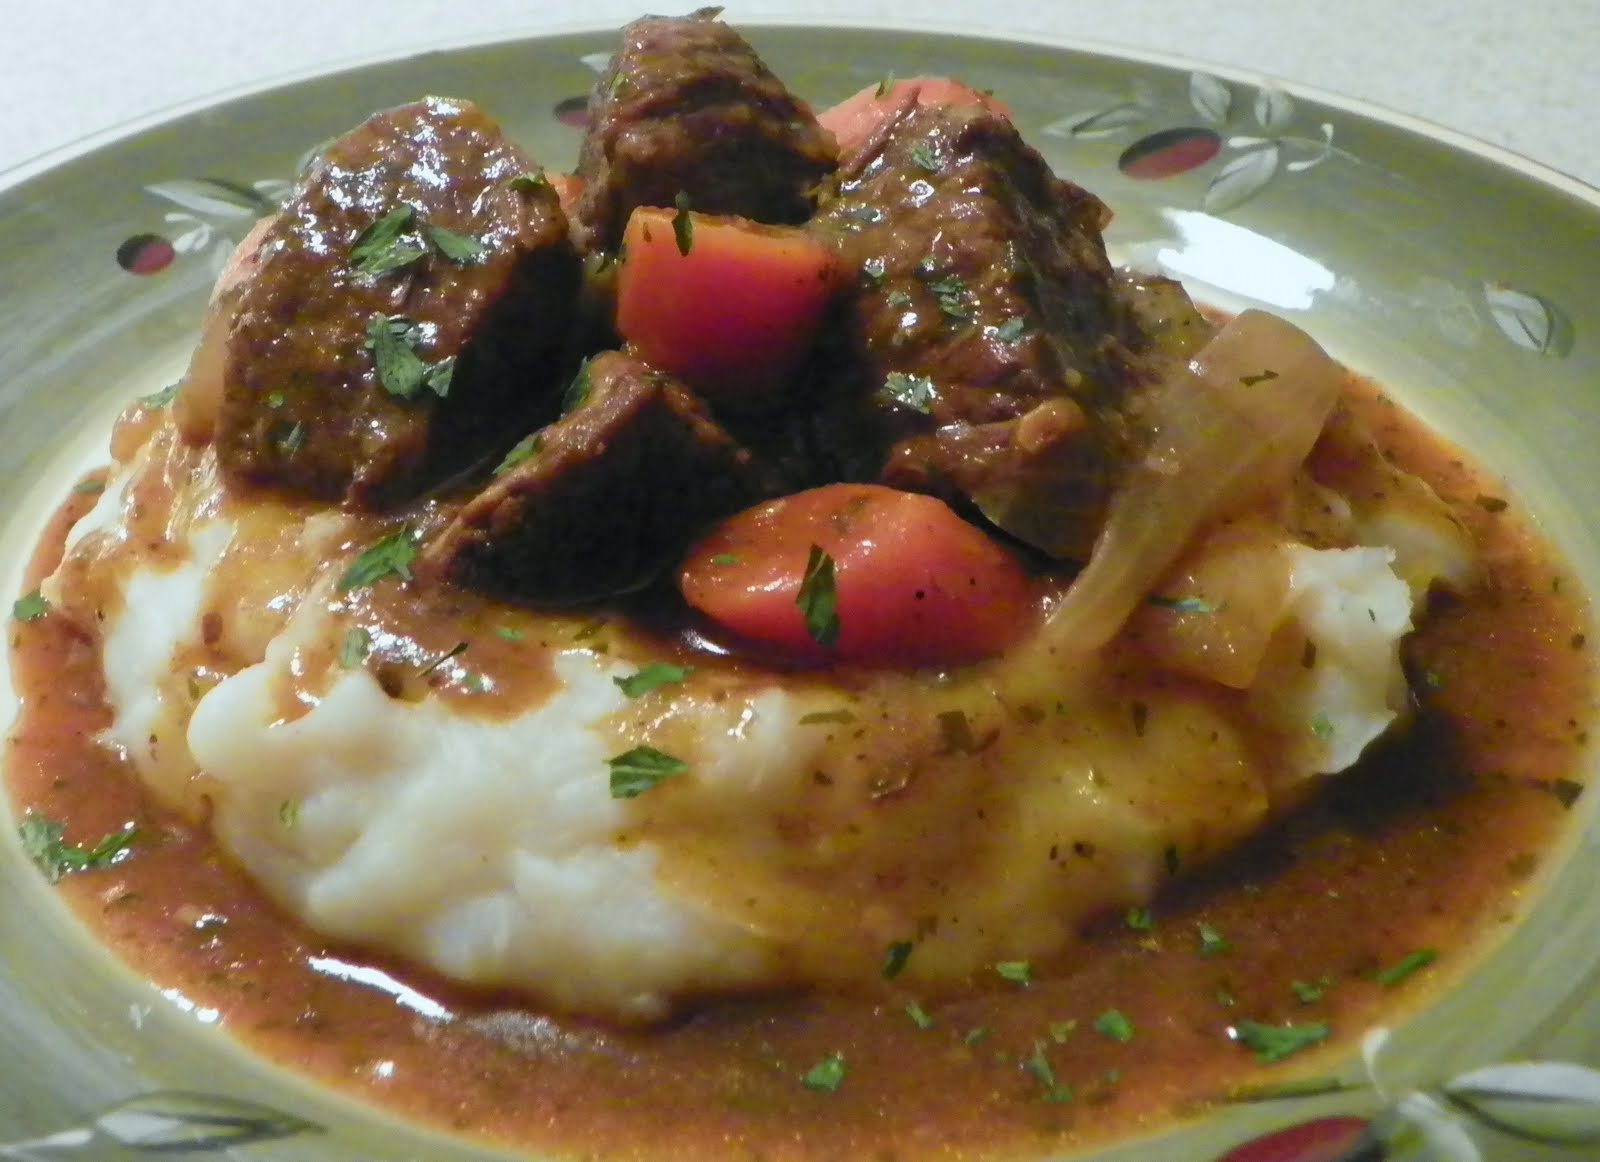 Beef Stew Ina Garten what's for dinner tonight ladies? *recipes*: beef bourguignon